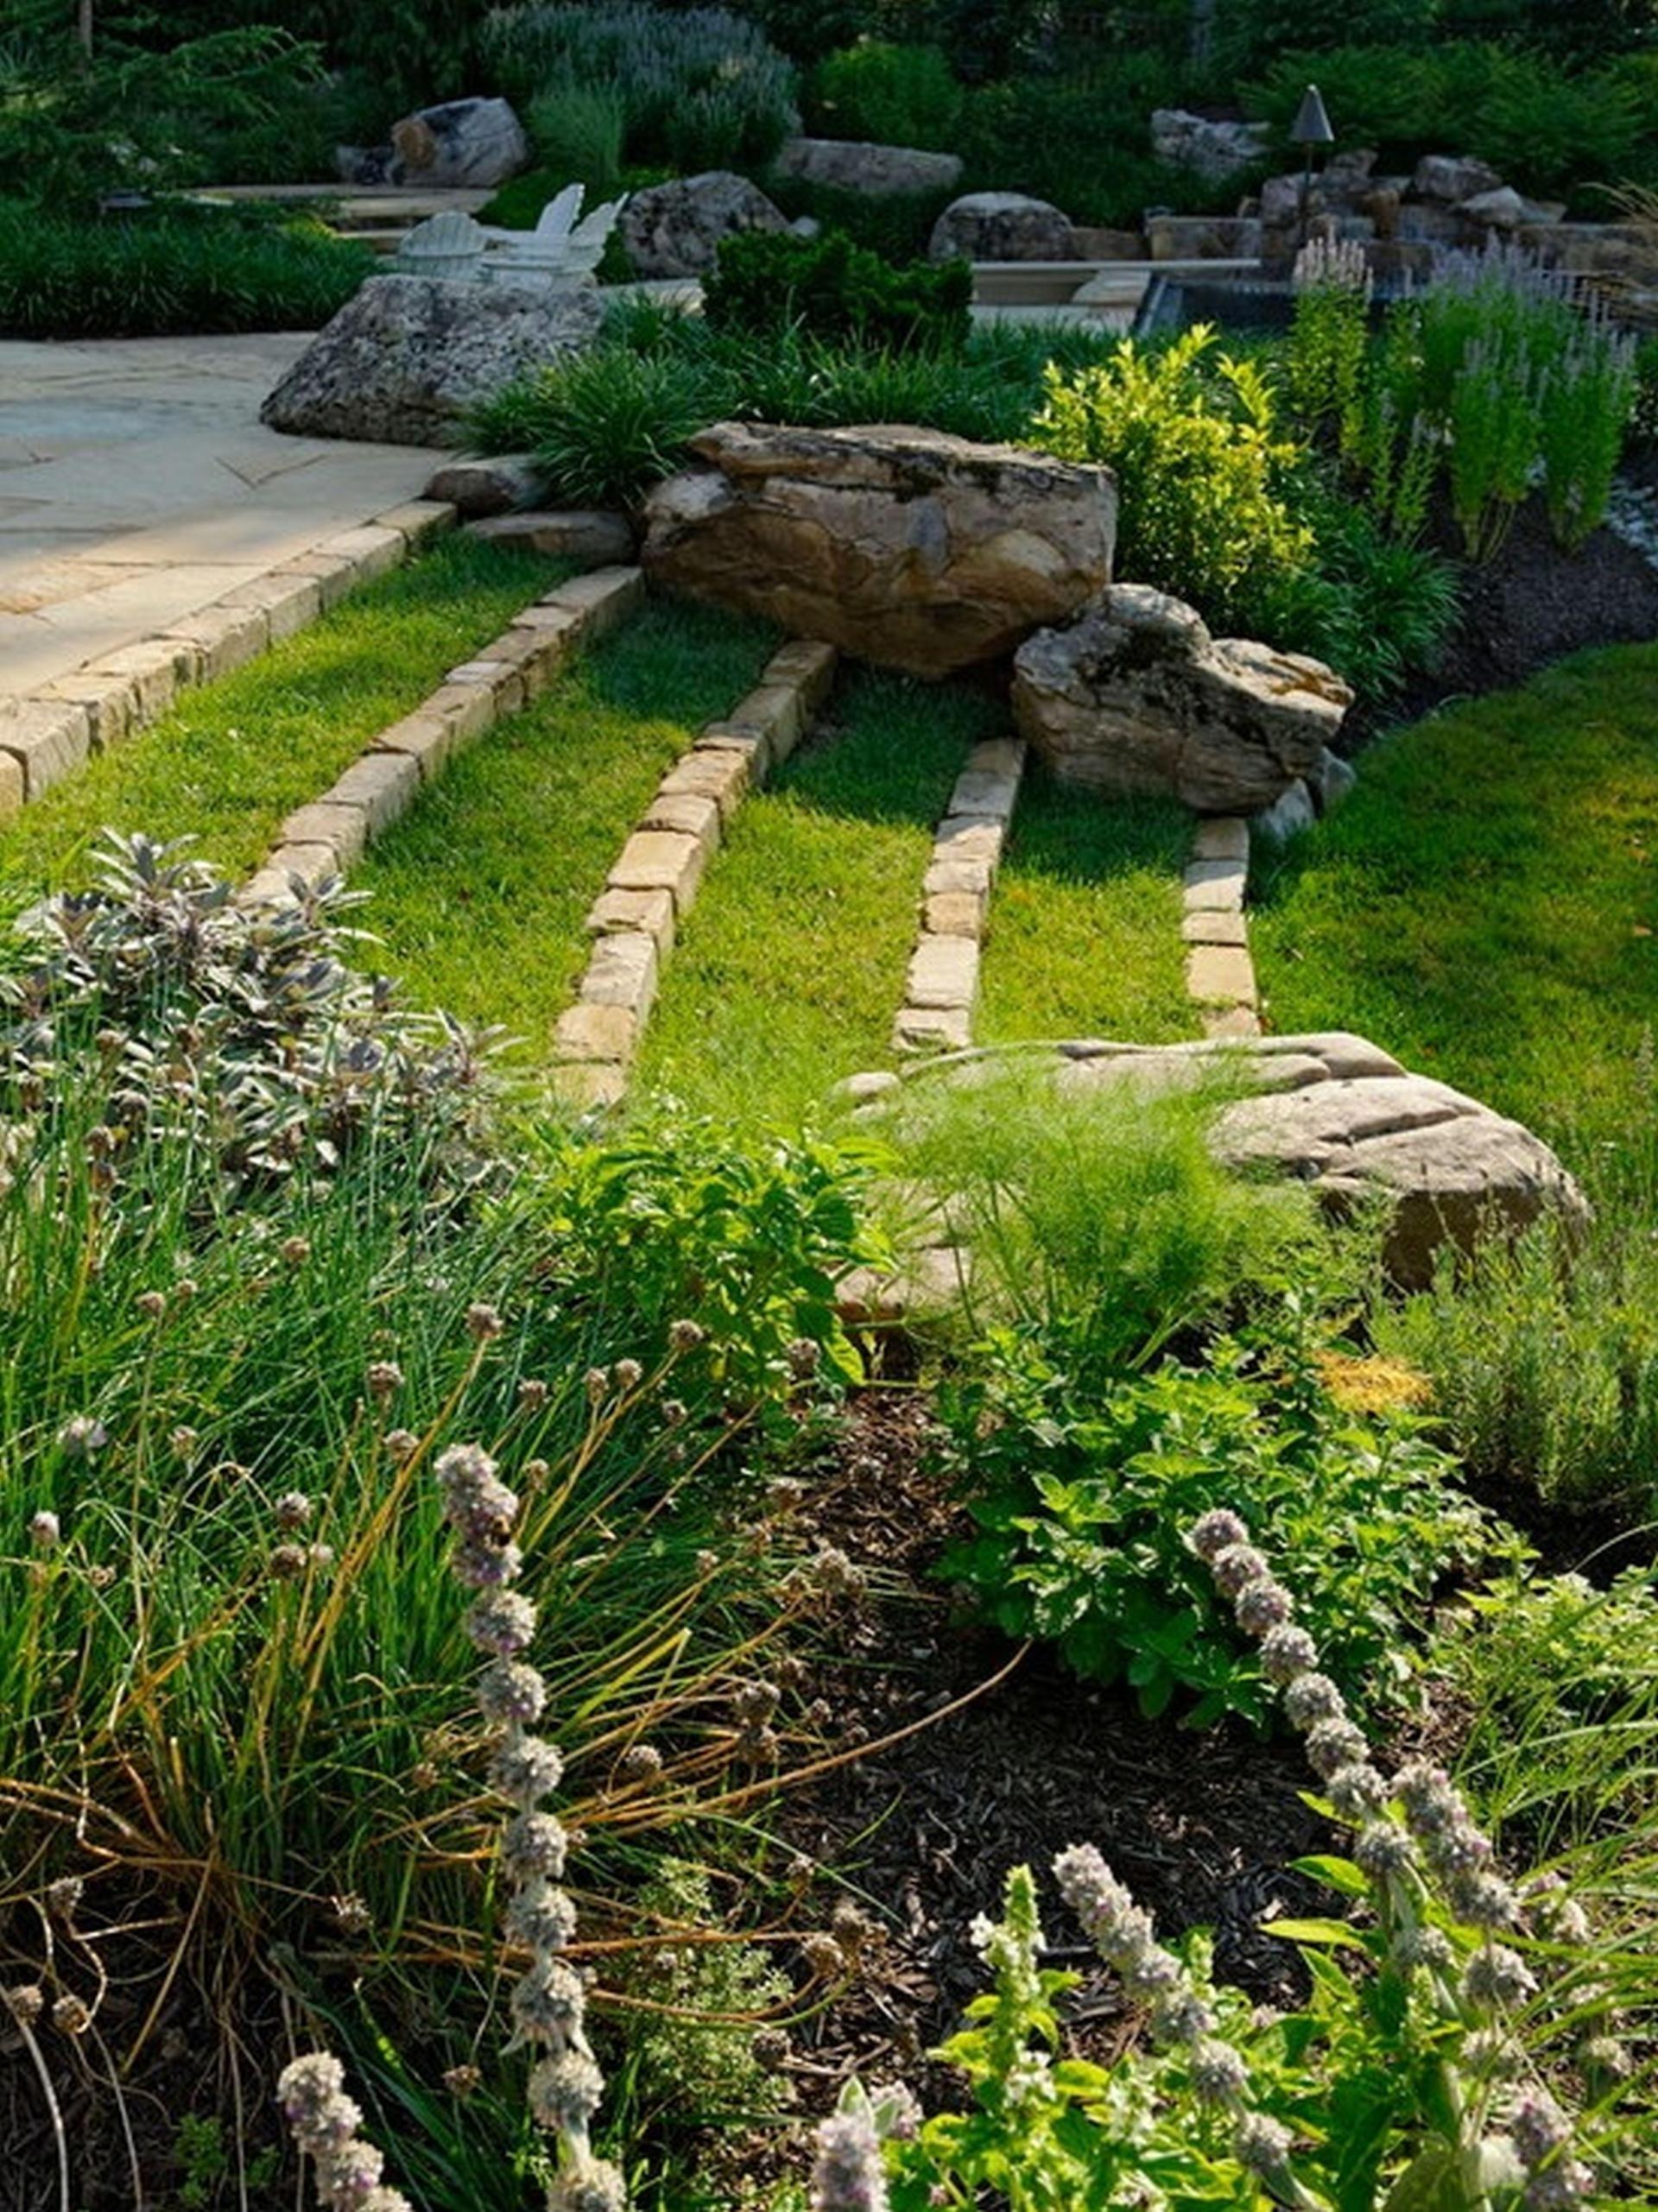 Backyard Landscaping Landscape Design Style The Best Look For Your Yard Diy Landscape Backyard Sloped Backyard Landscaping Sloped Garden Sloped Backyard